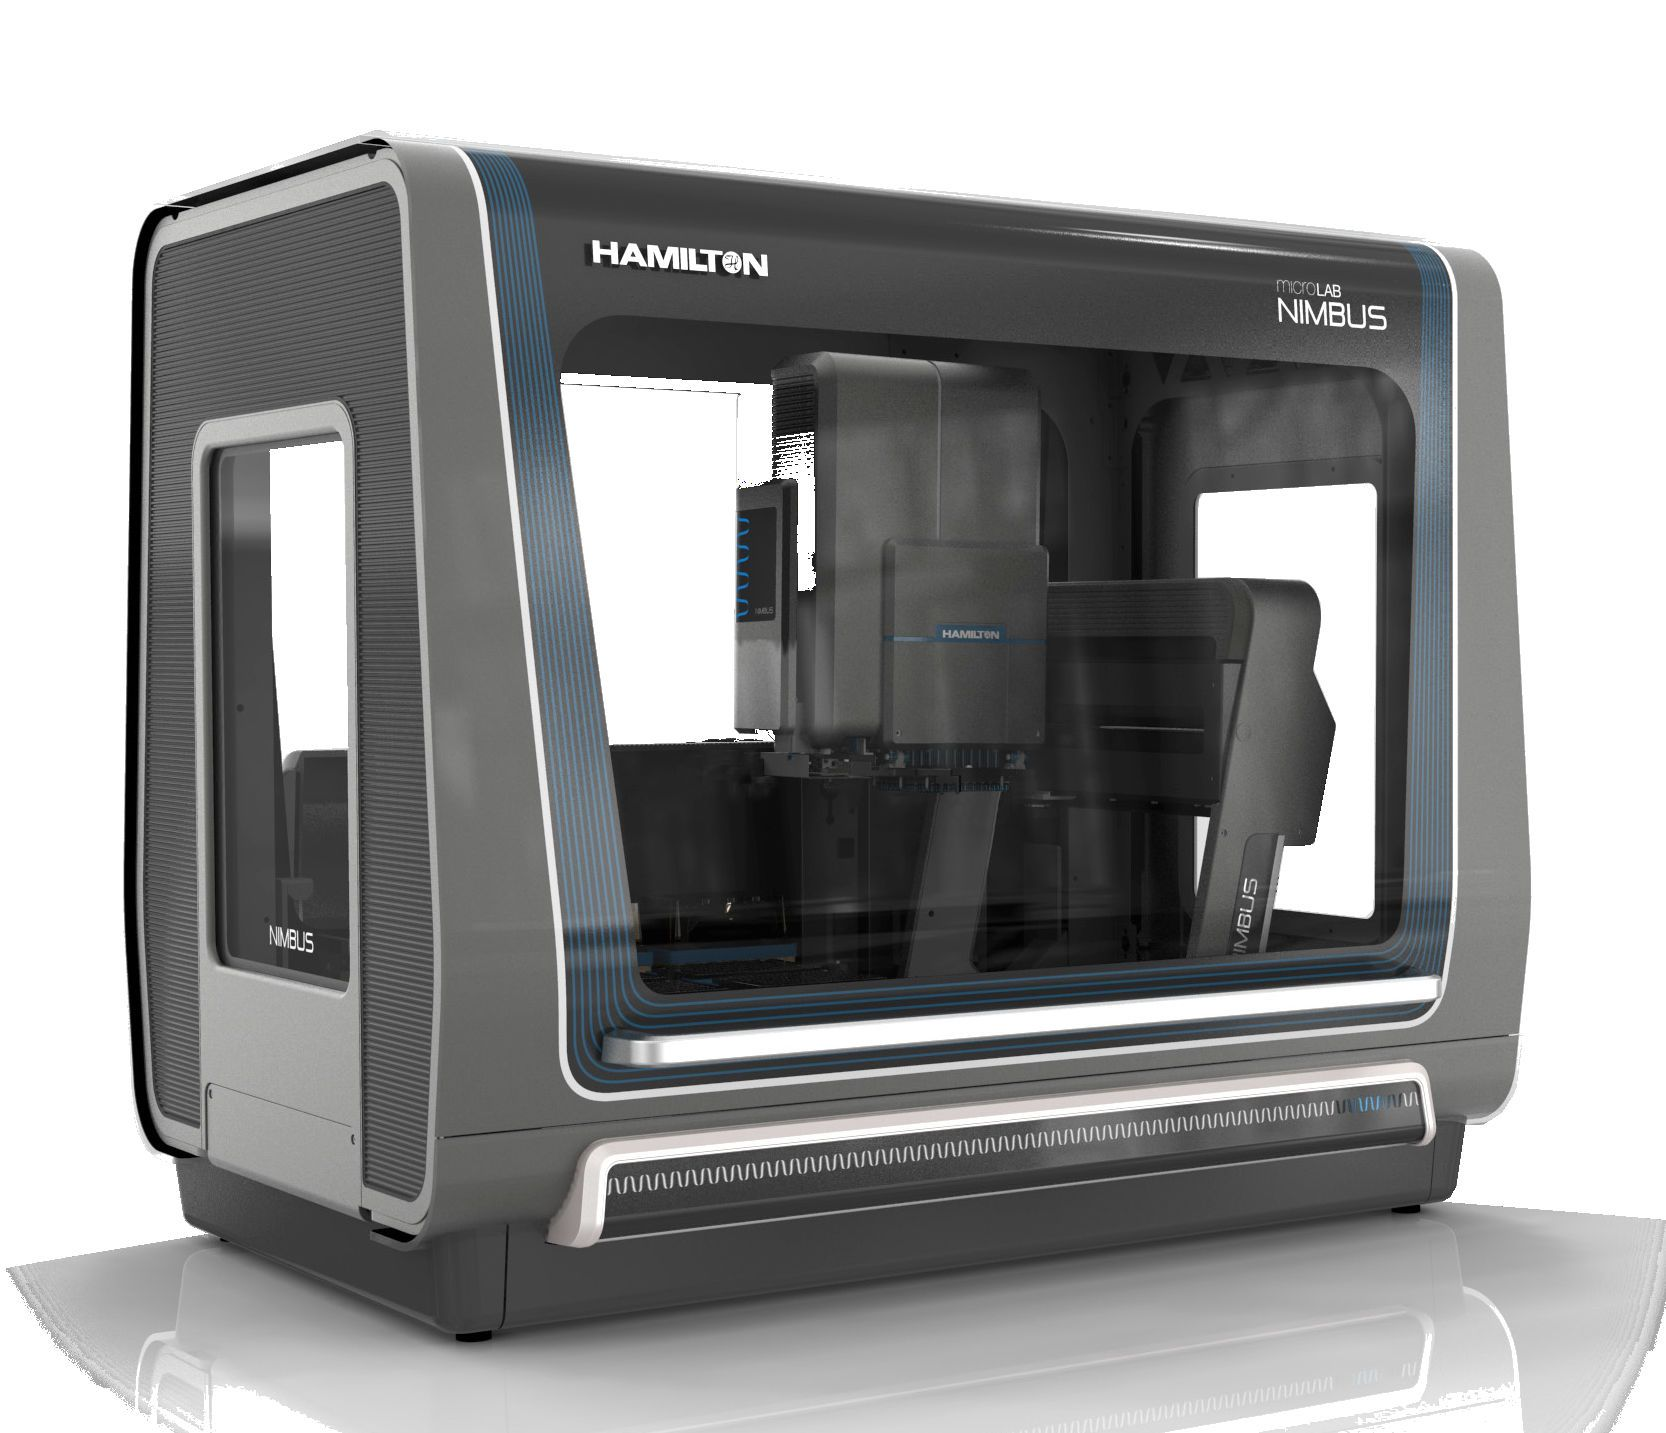 Hemilton Microlab Nimbus   Machine Design - Housings   Pinterest